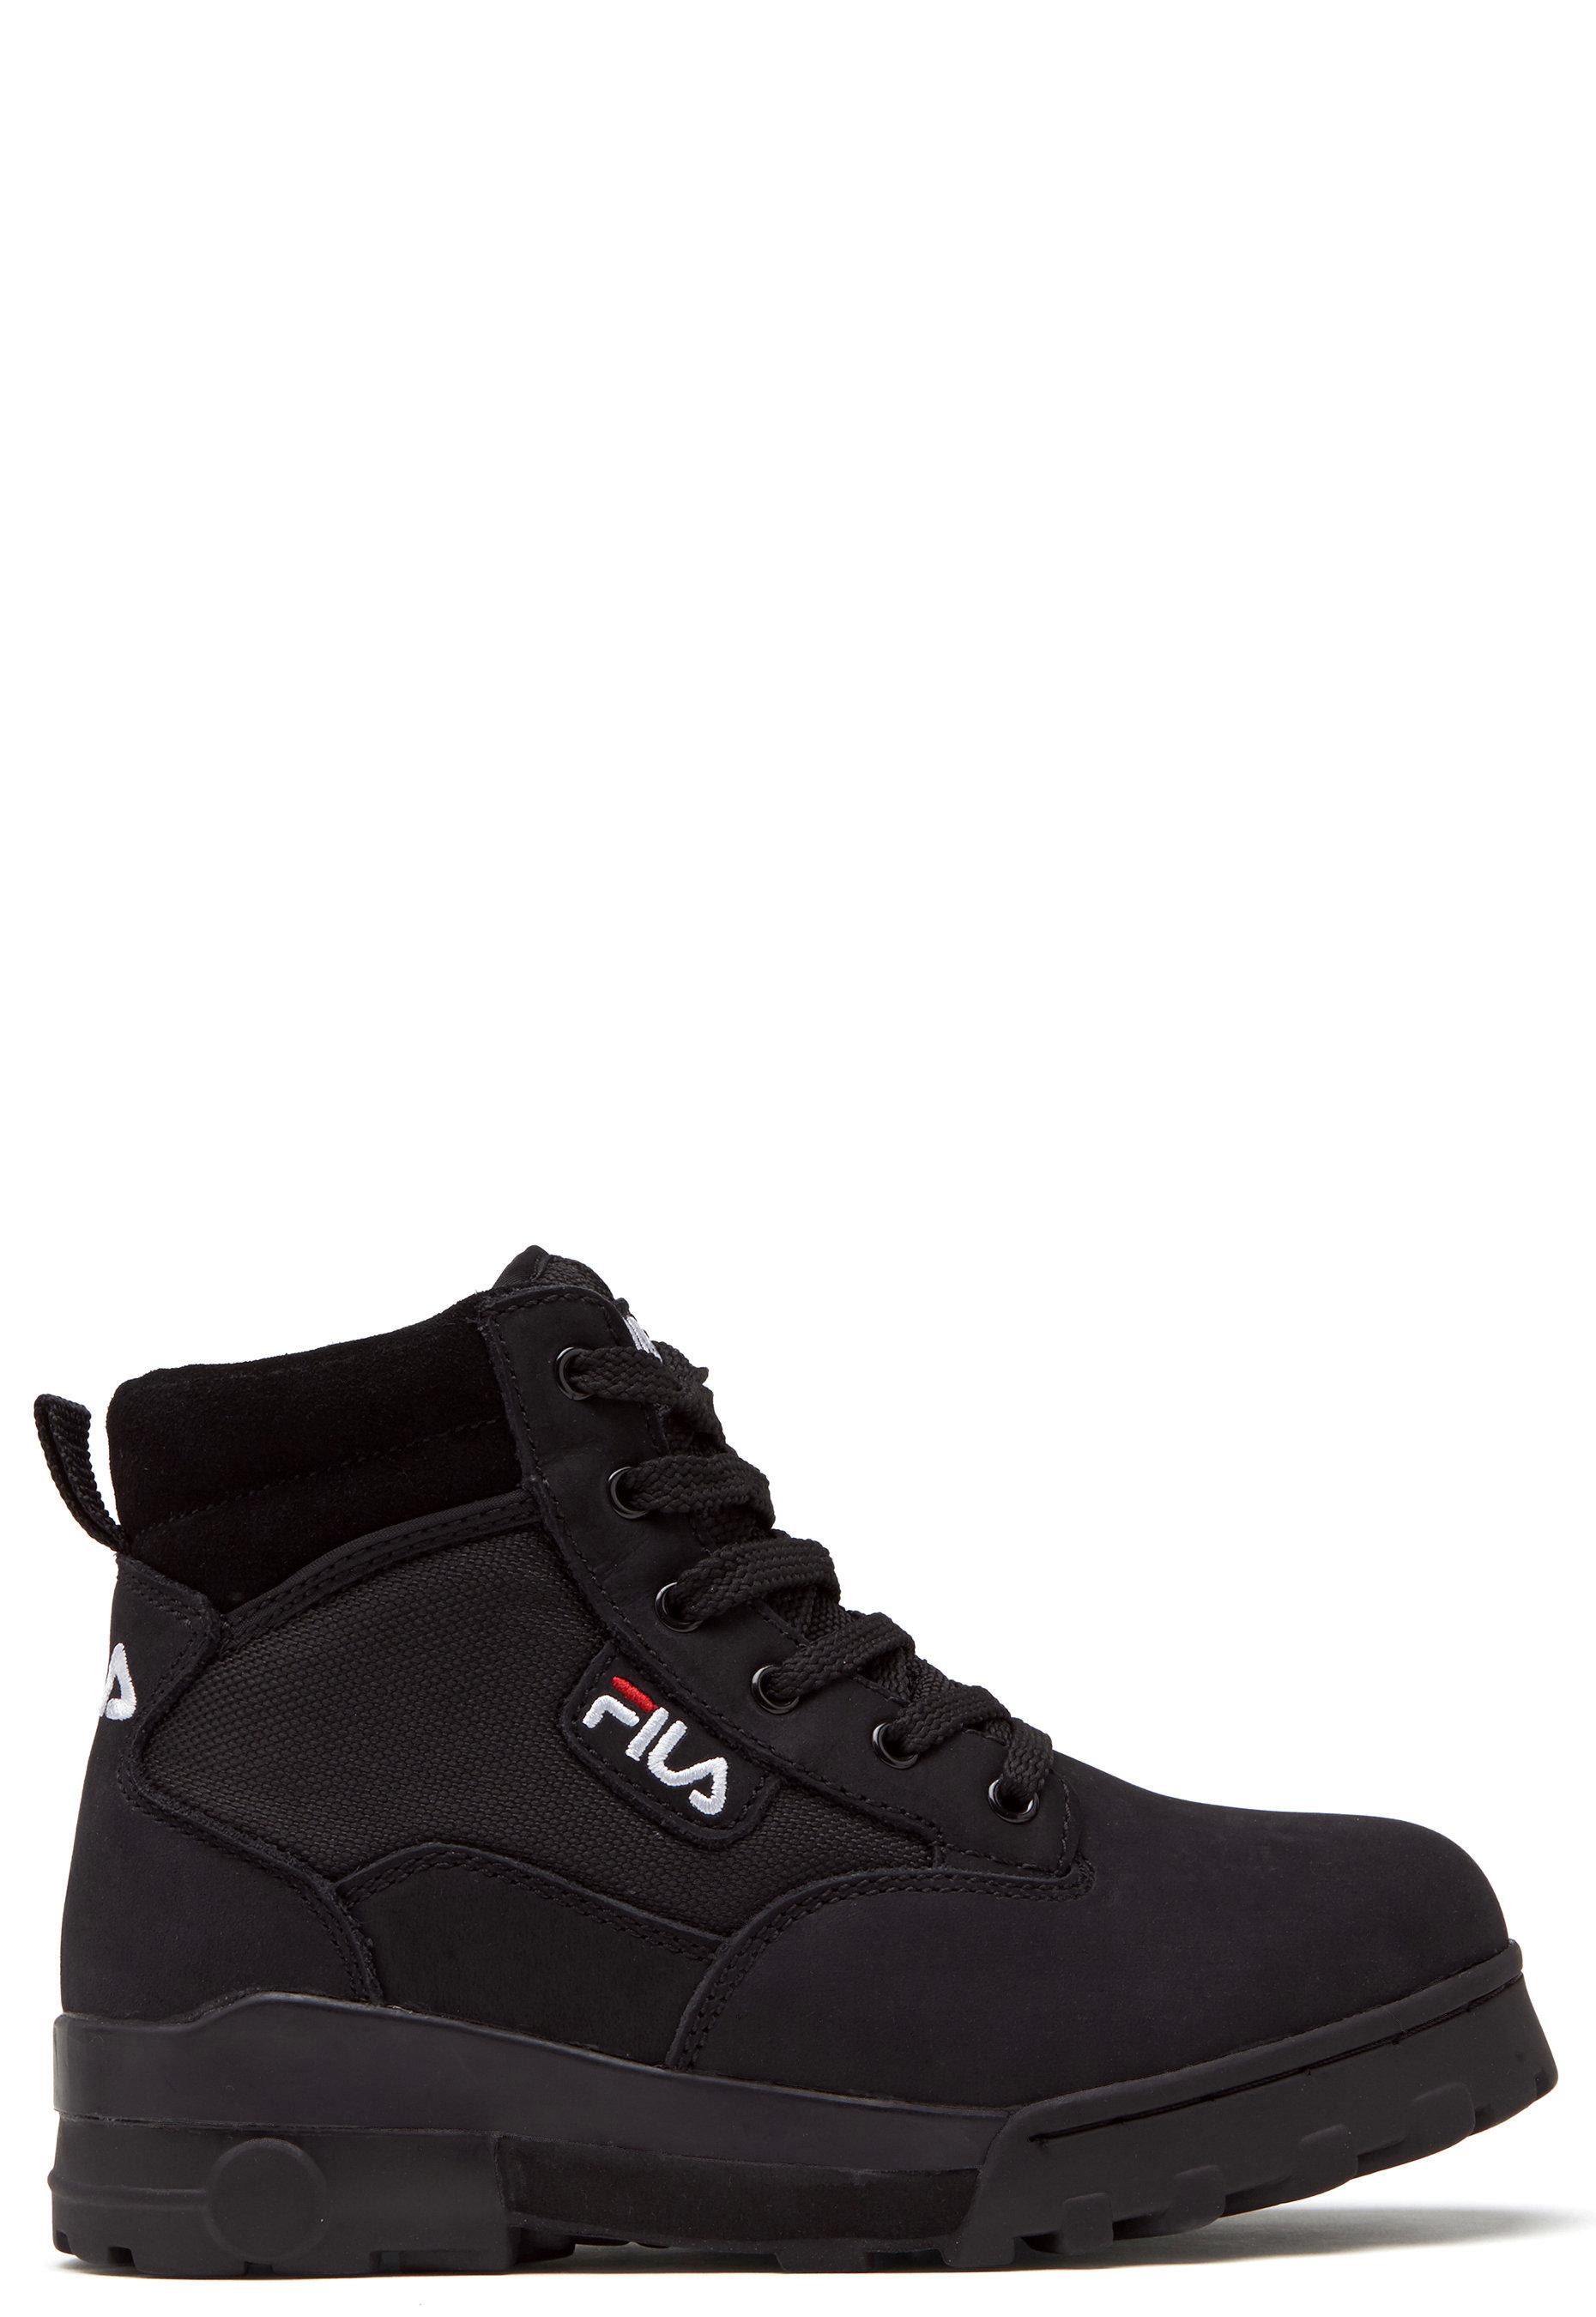 FILA Grunge Mid Wmn Boots Black Bubbleroom